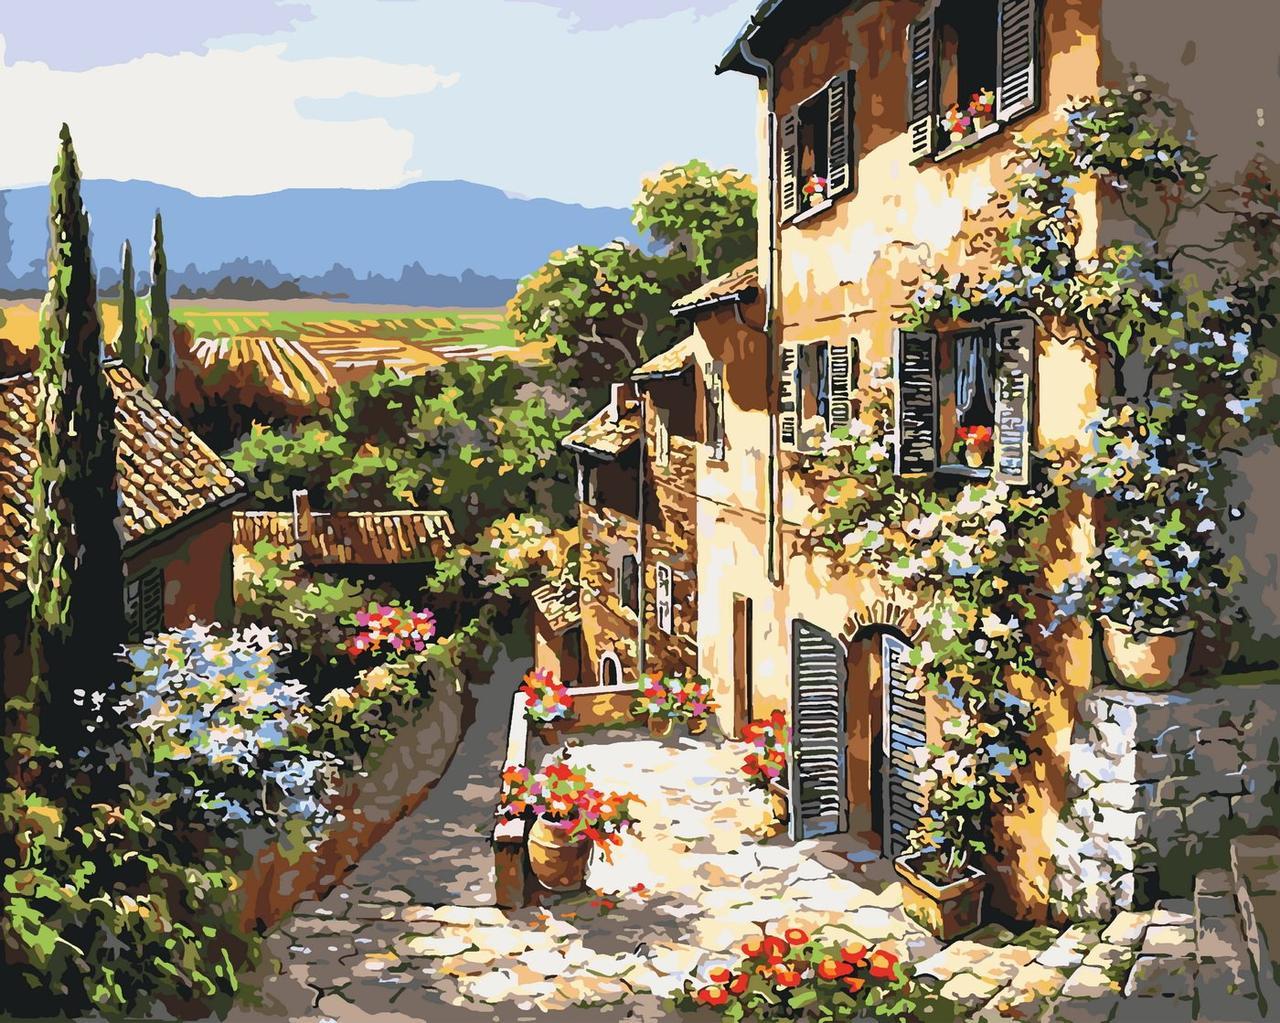 КНО2232 Раскраска по номерам Пейзажи Тосканы, Без коробки